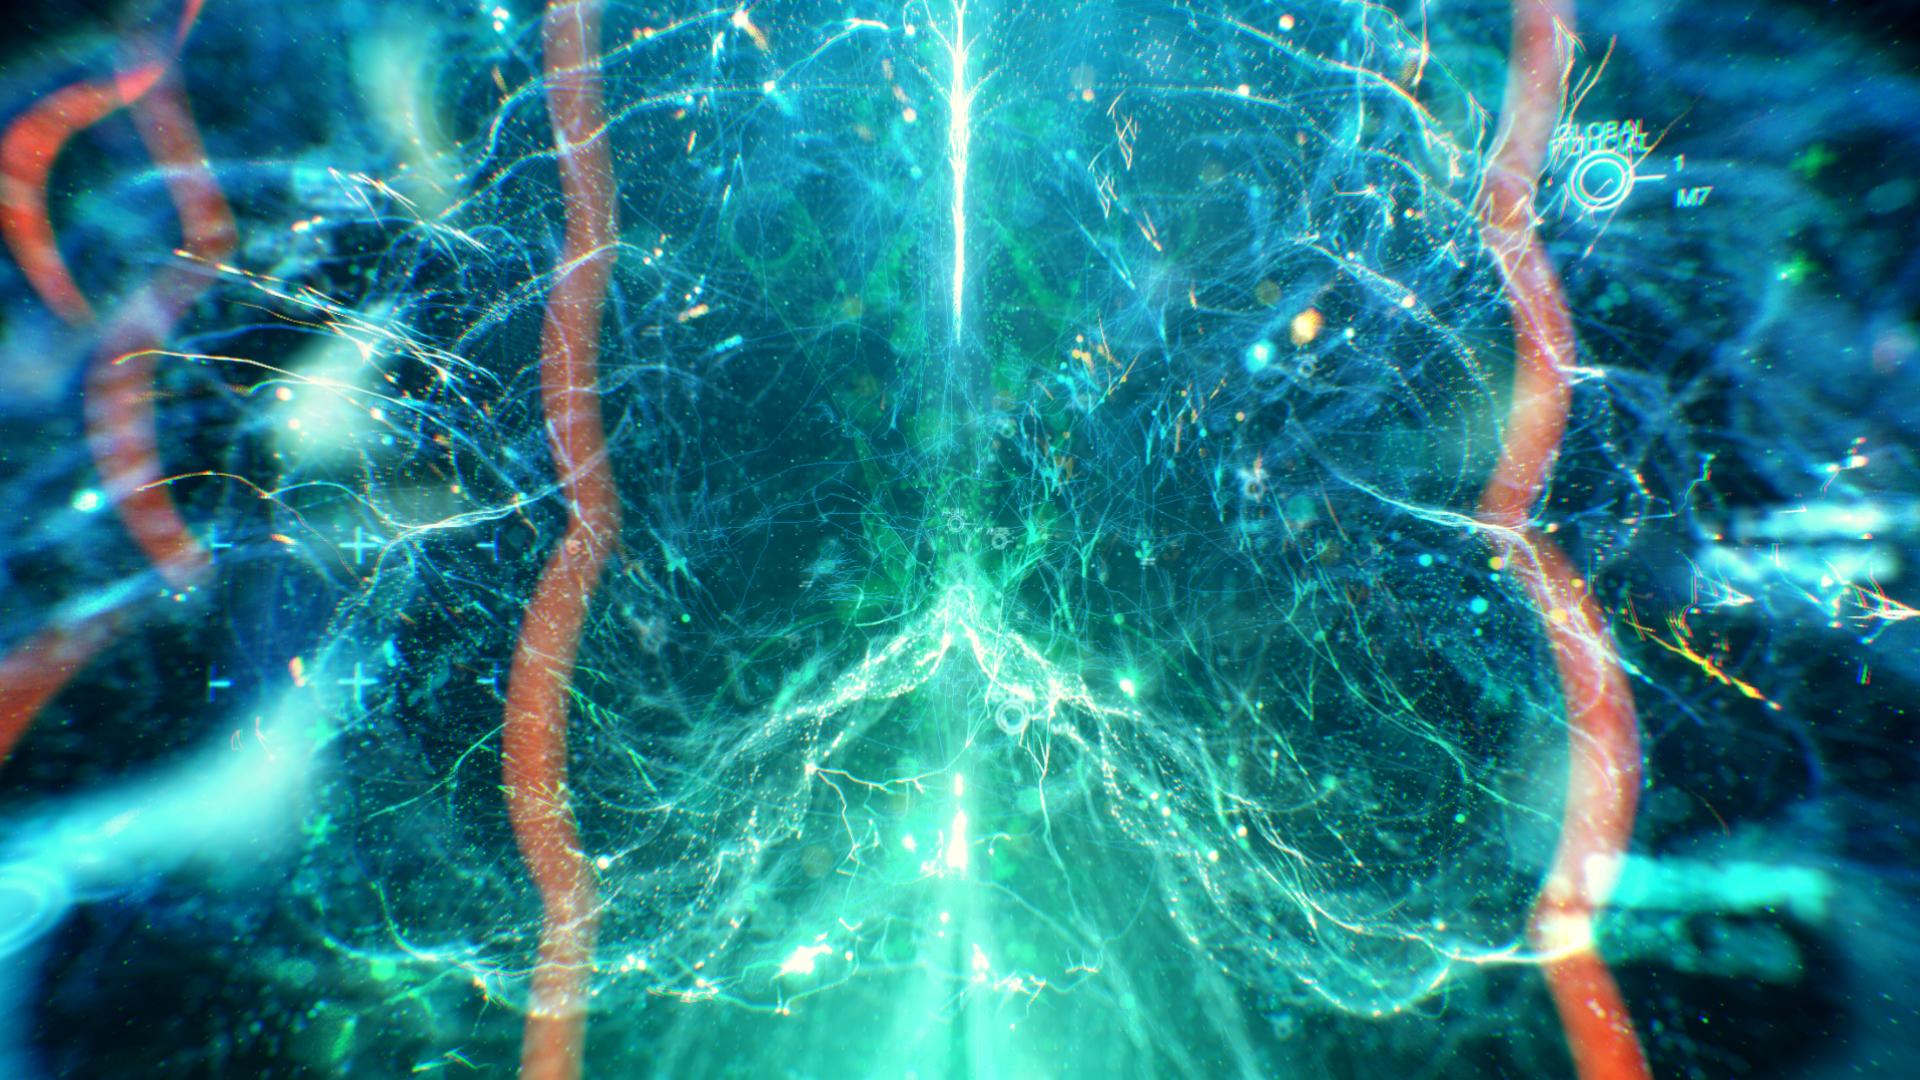 171220_brain_cam6_v4_00030.jpg